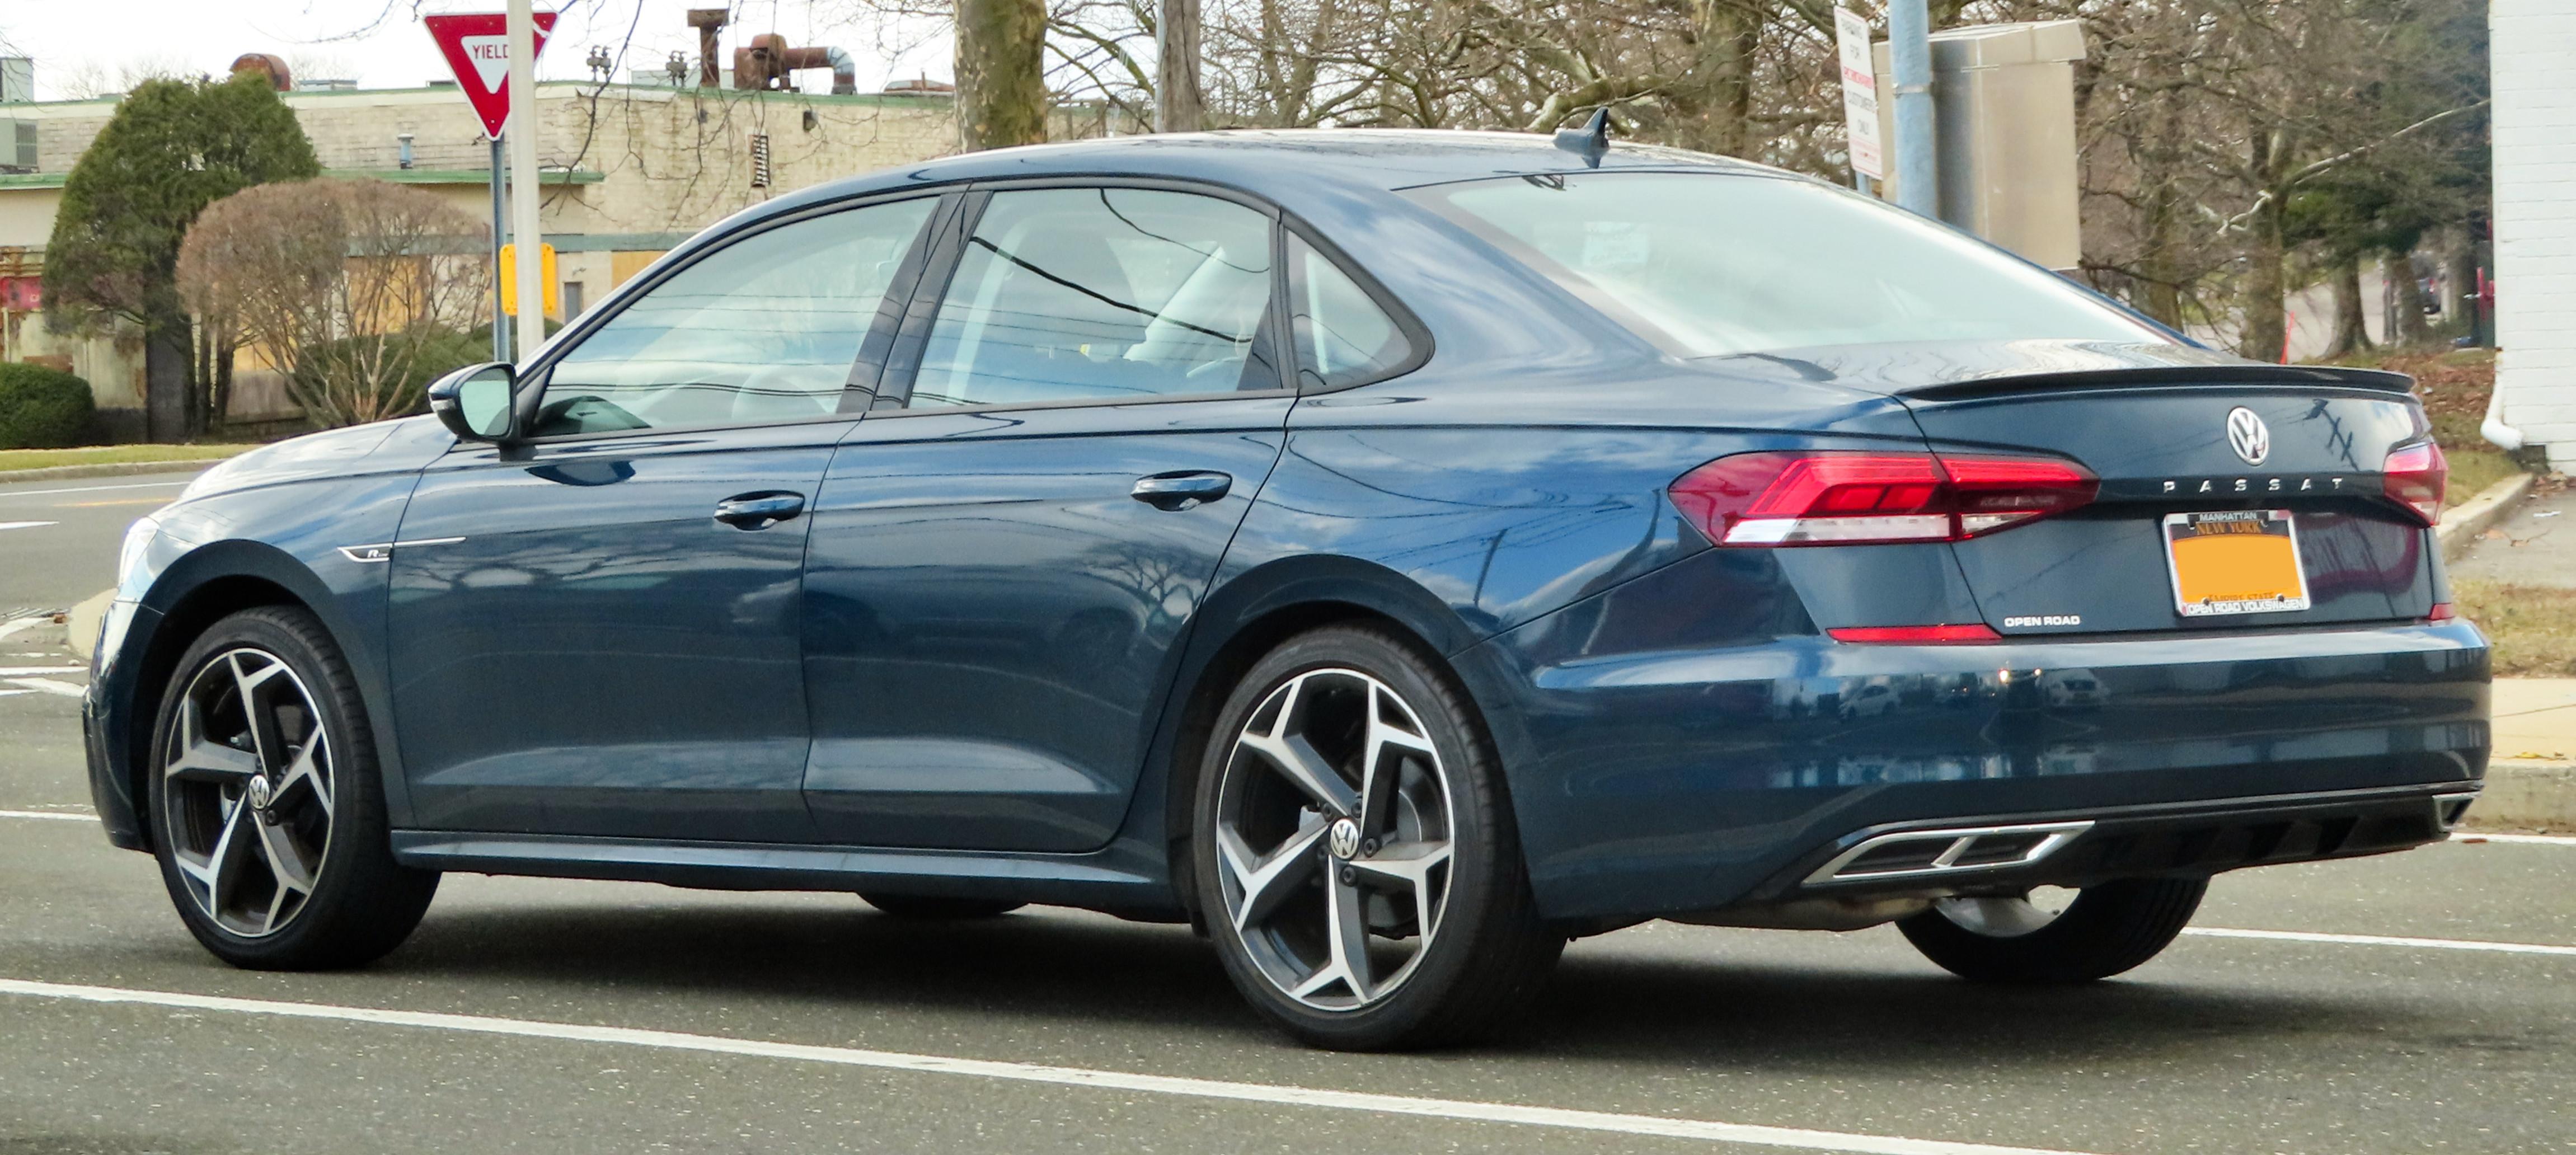 File:2020 Volkswagen Passat R-Line (NMS II), rear 2.29.20.jpg ...